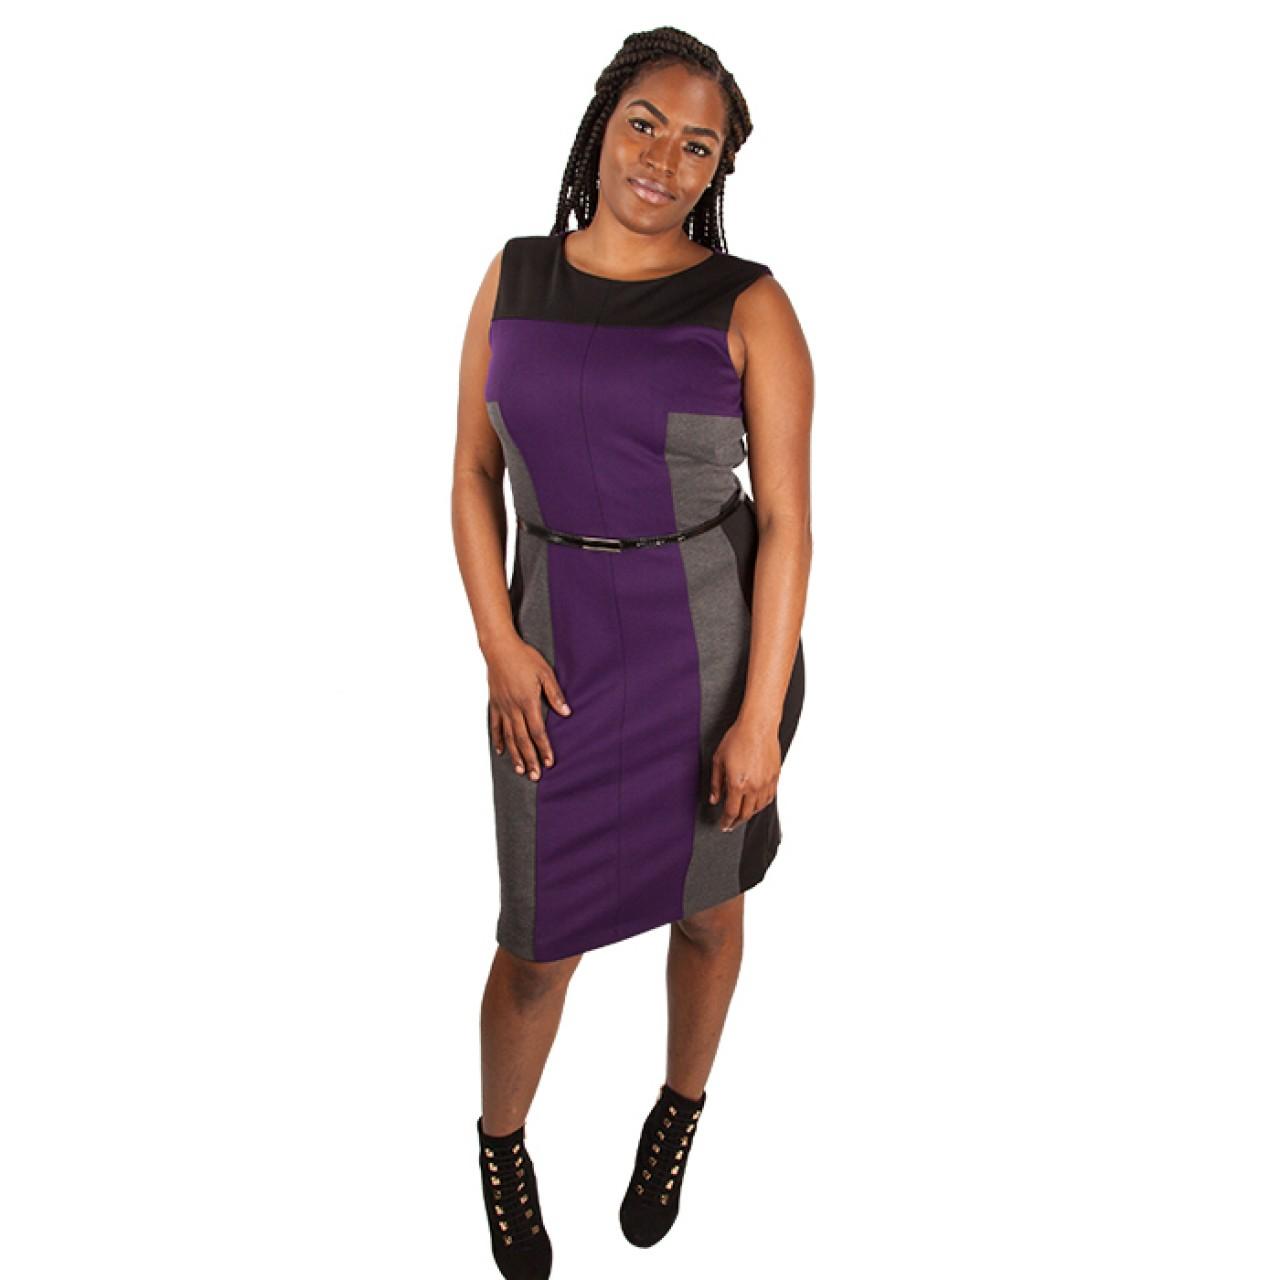 Formal Little Stylish Sheath Sleeveless Dress